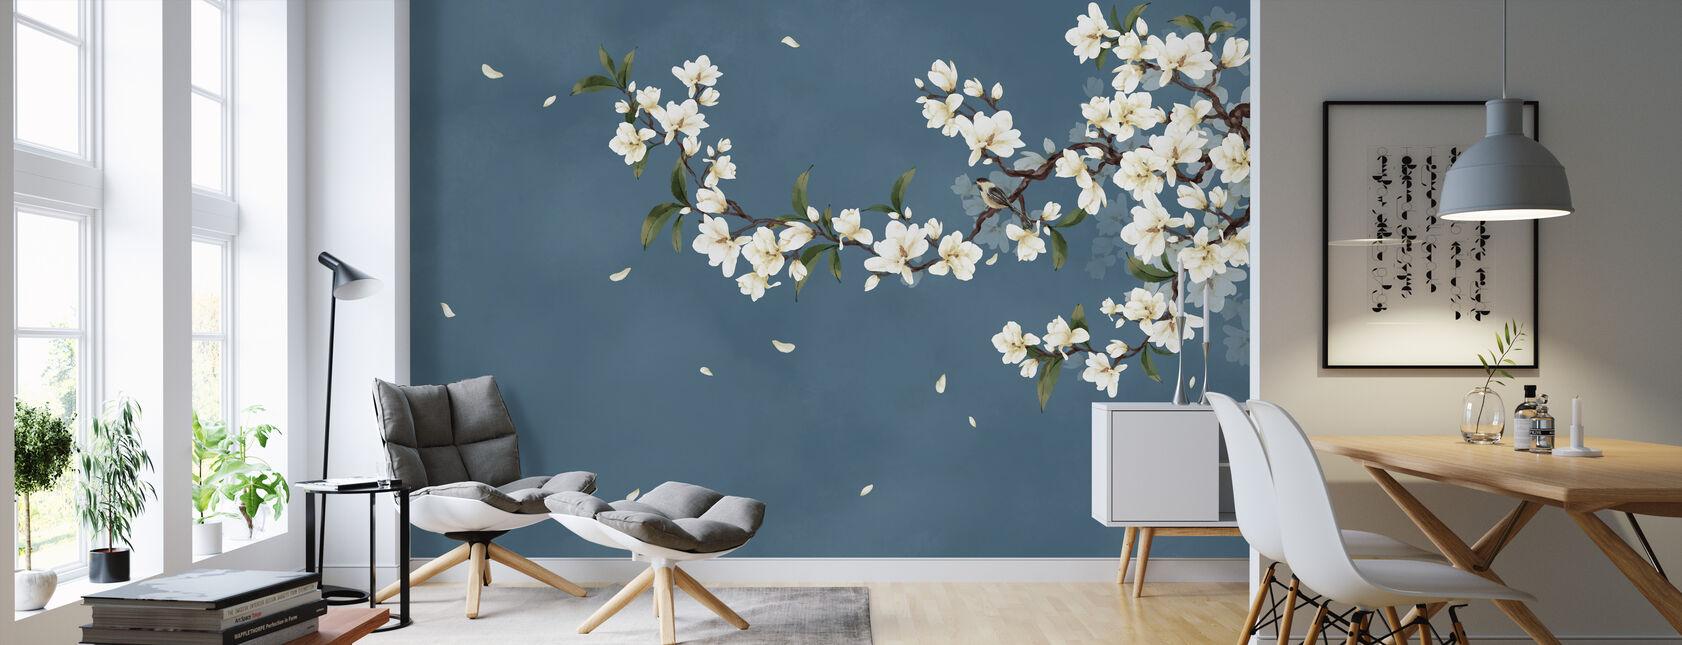 Twig - Wallpaper - Living Room